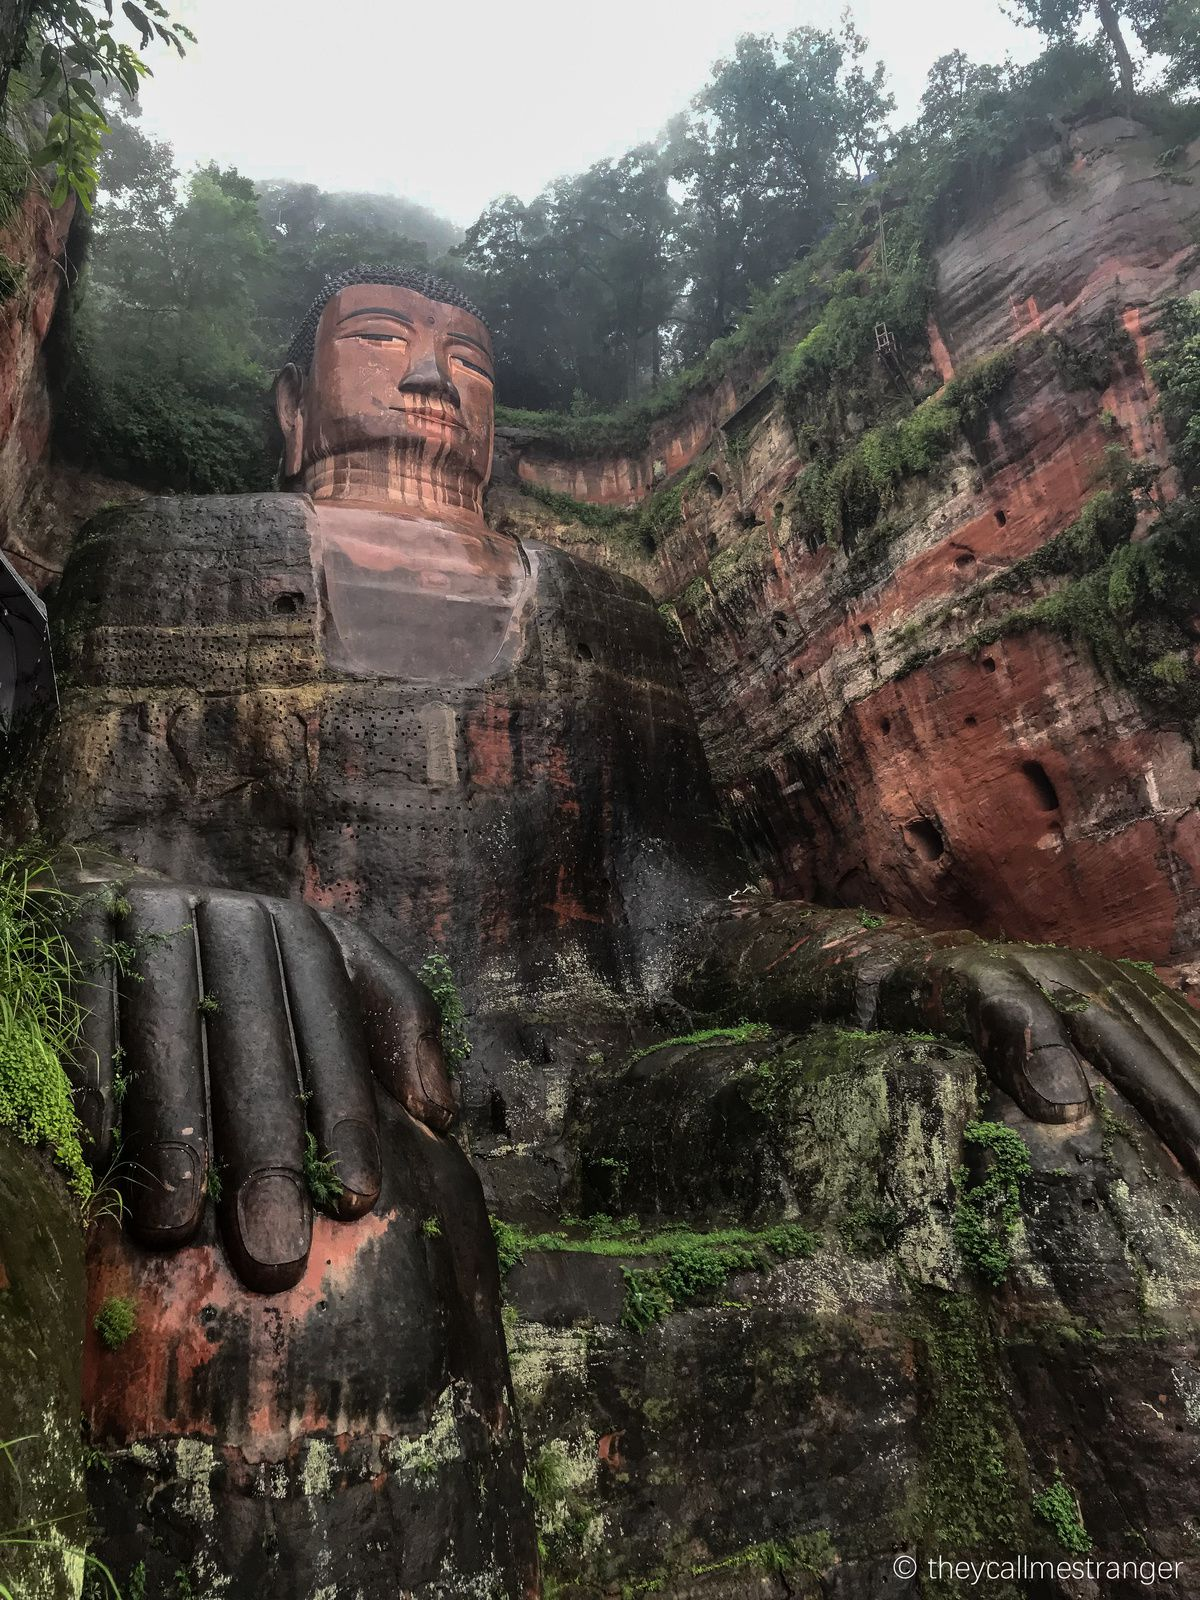 Le grand Bouddha de Leshan 乐山大佛